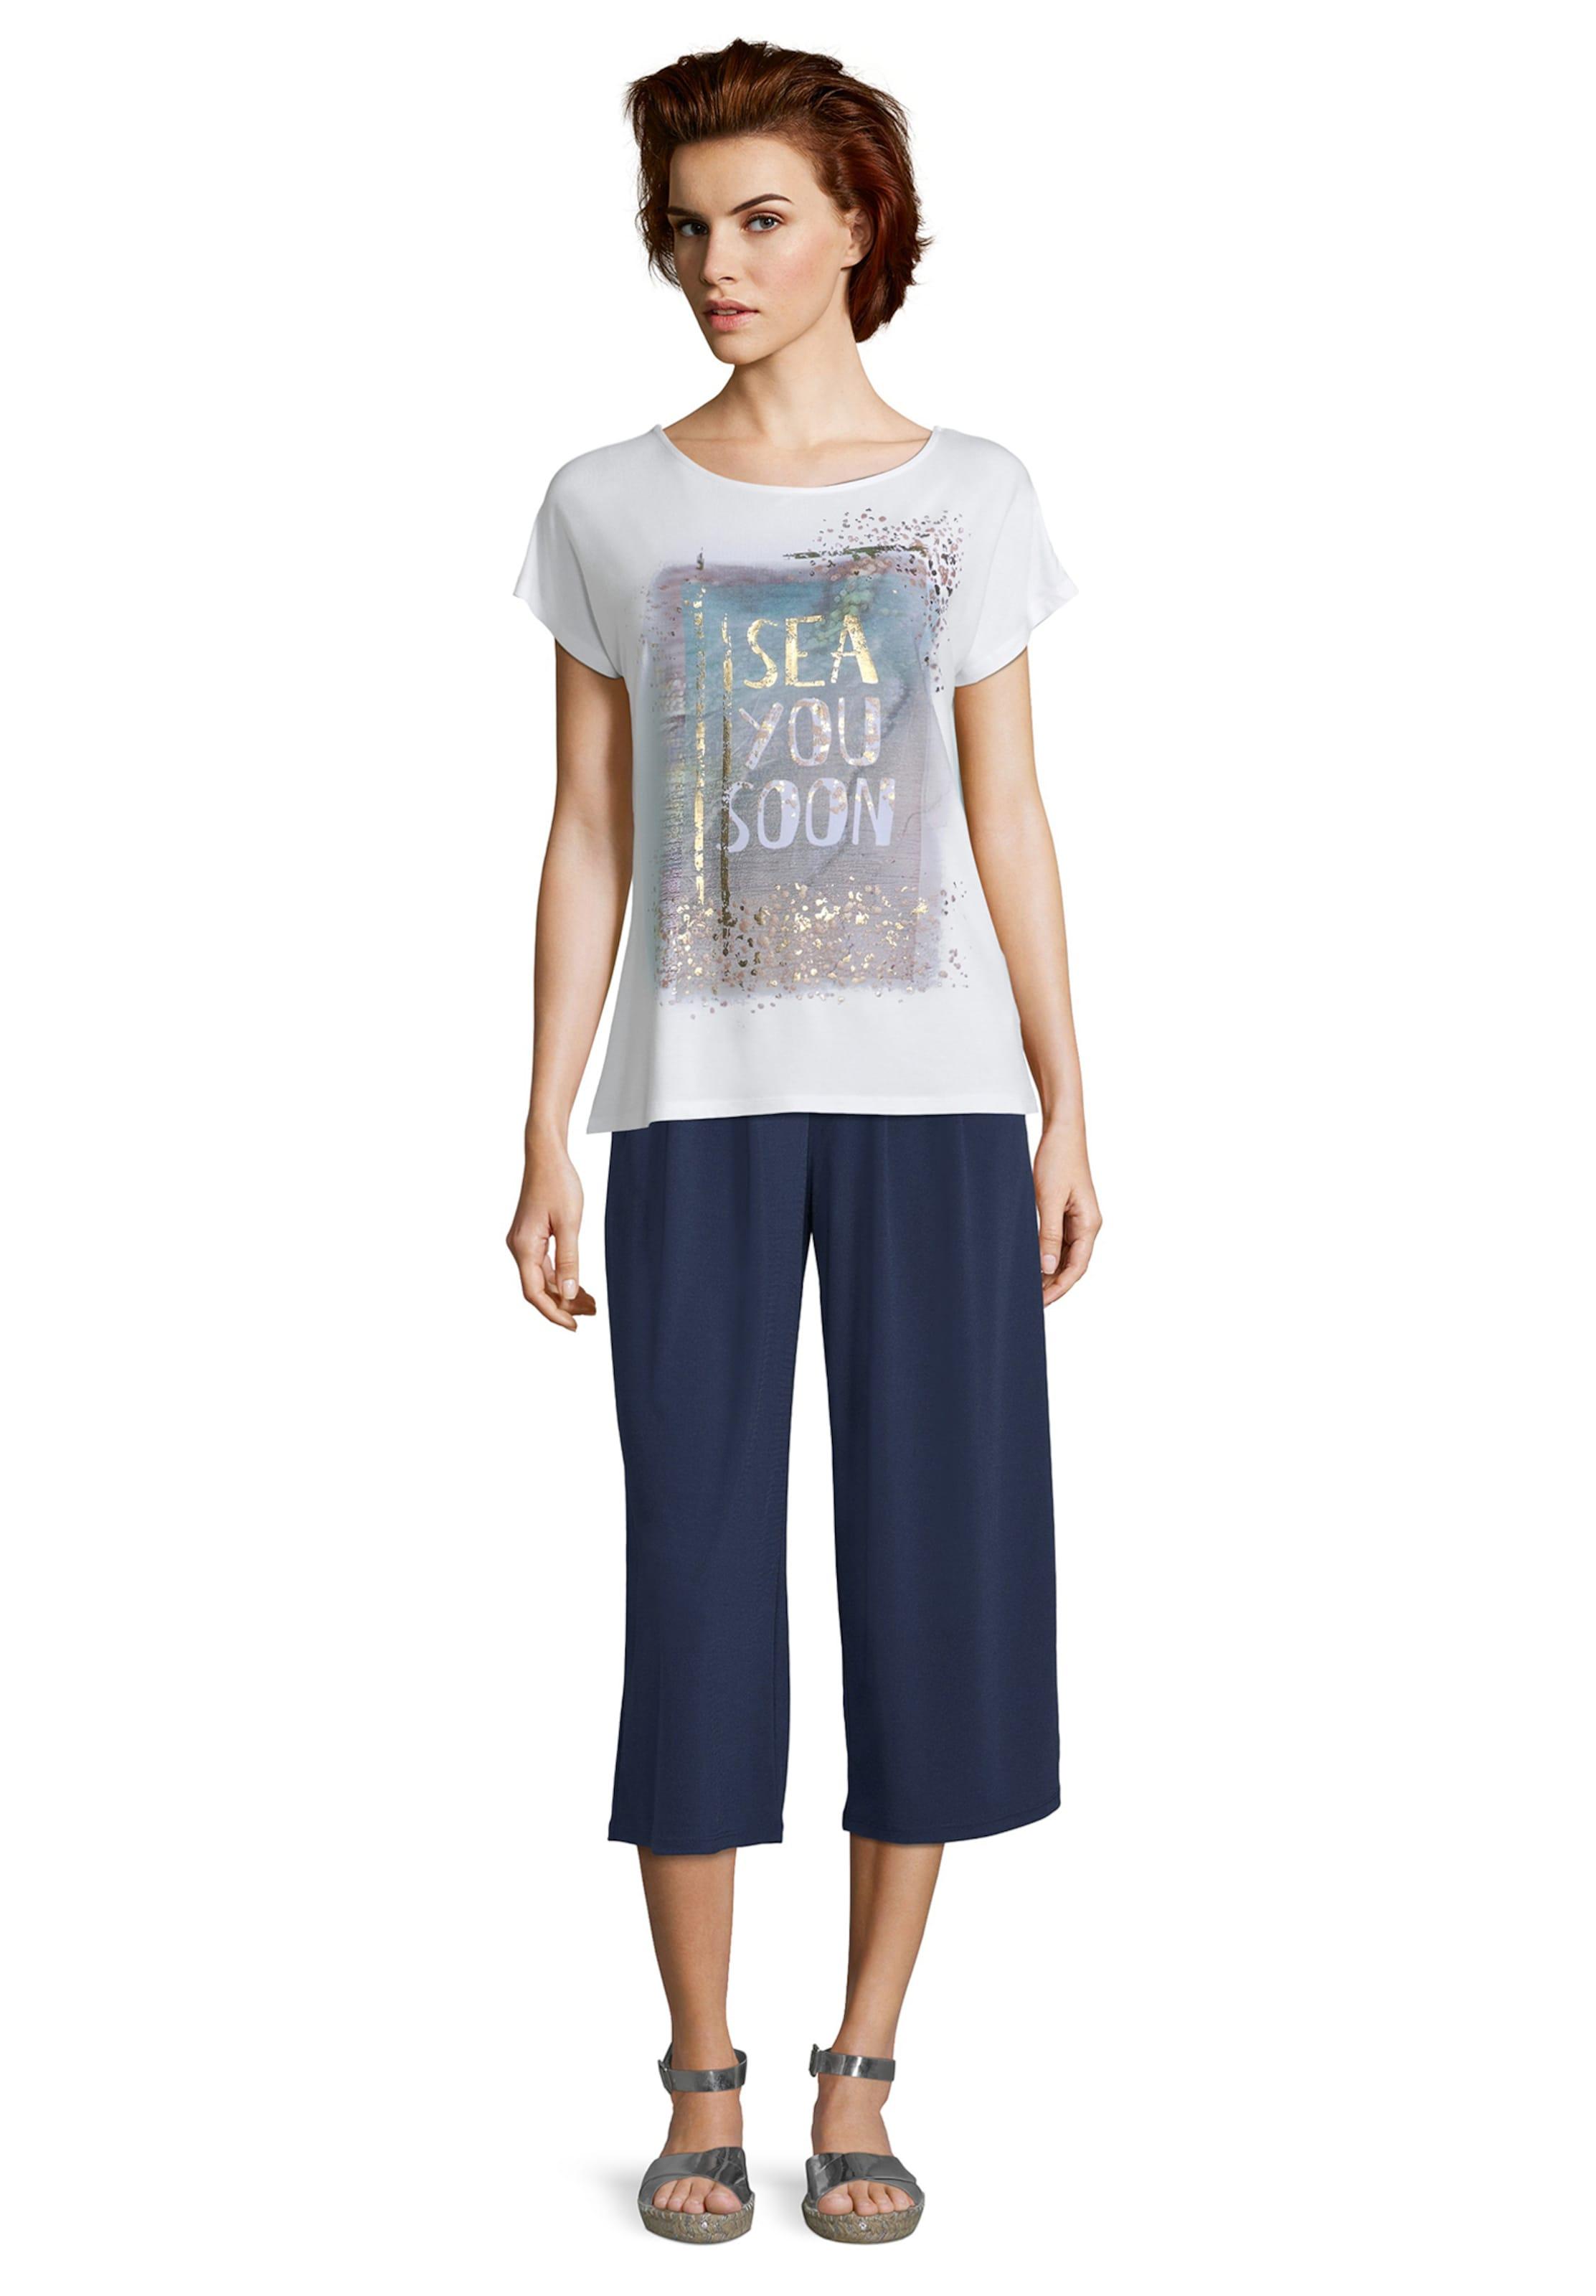 Jade Shirt Lavendel Betty Barclay Weiß OpalGold In wOZTkuXiP